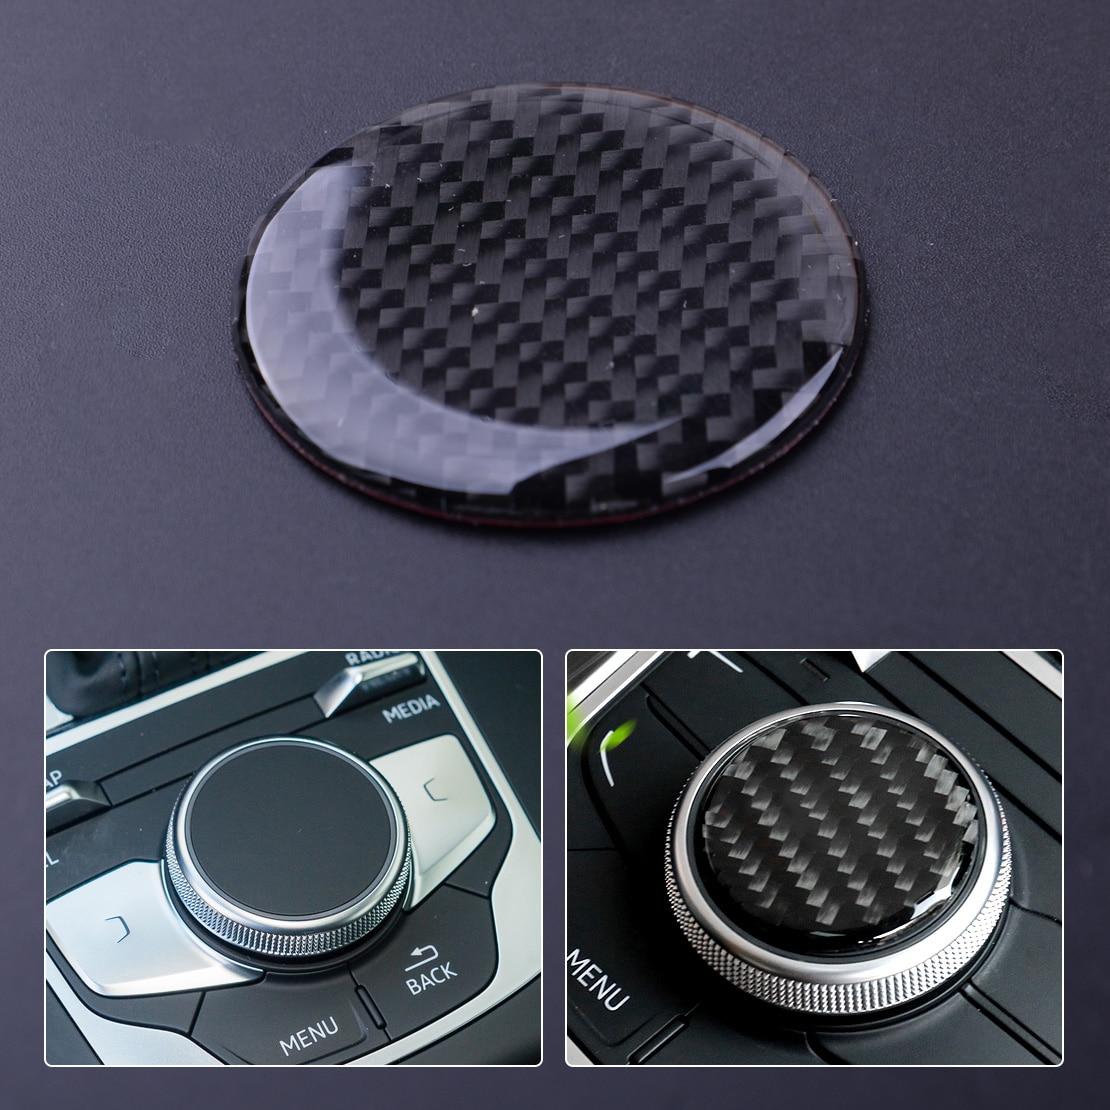 beler Carbon Fiber Black Car Multi-Media Control Knob Decor Sticker Fit For Audi A3 S3 8V 2014 2015 2016 2017 2018 2019